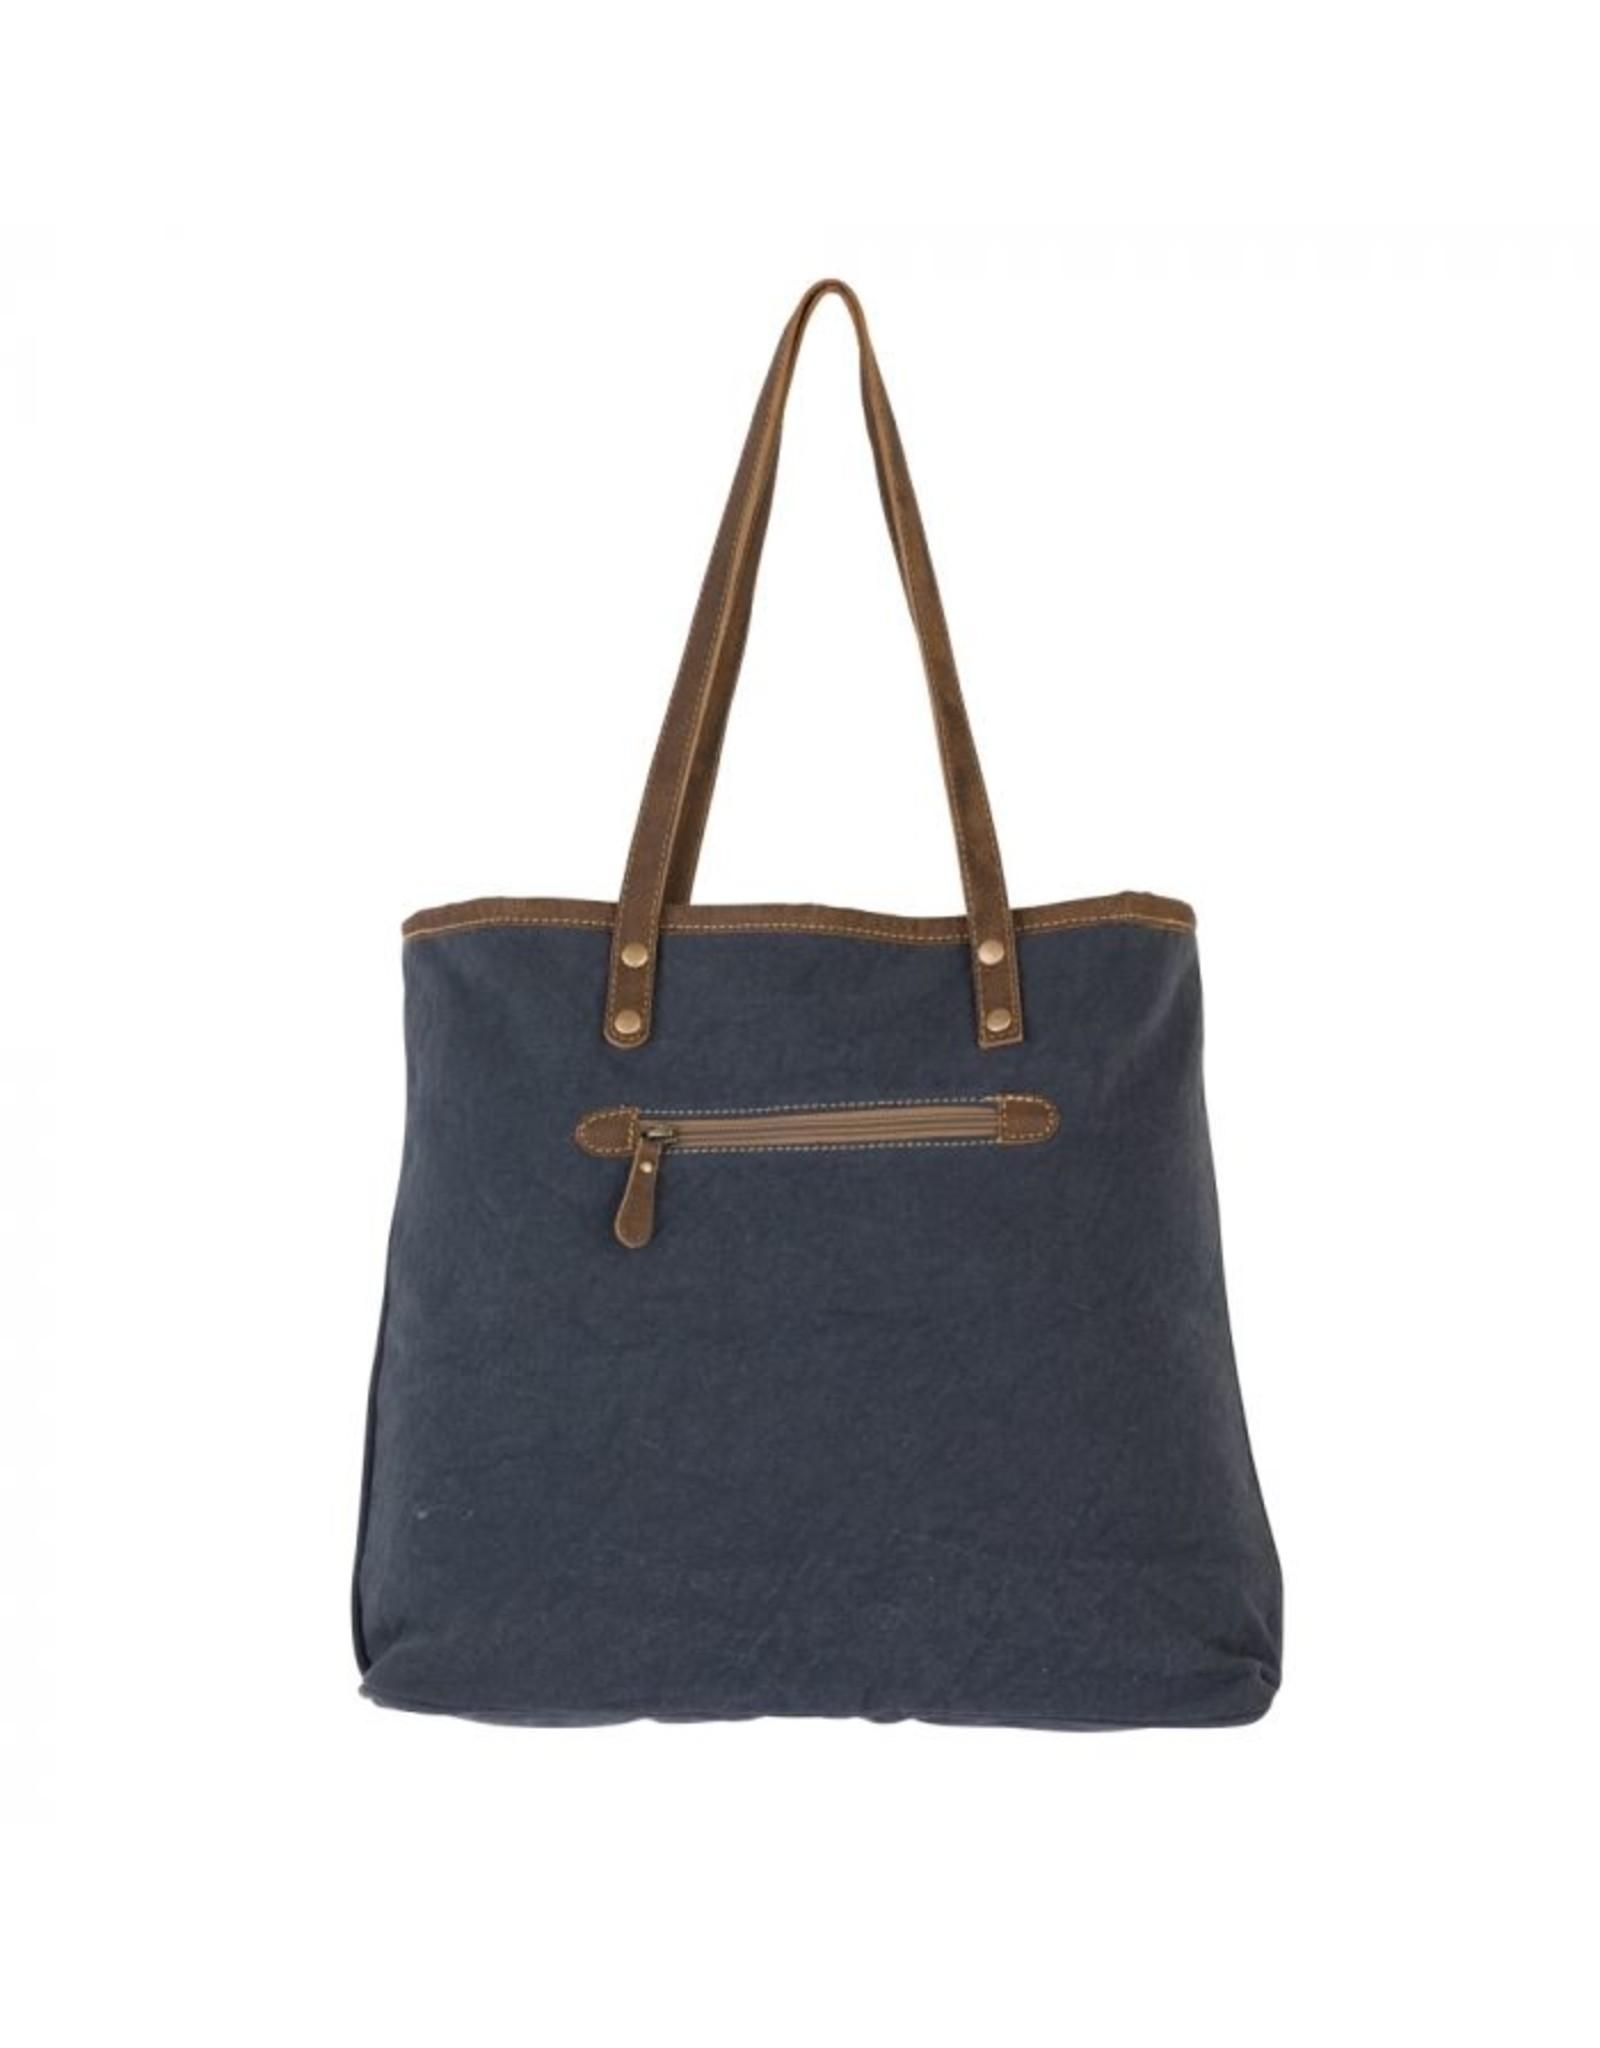 Myra Bag Dainty Lady Tote Bag